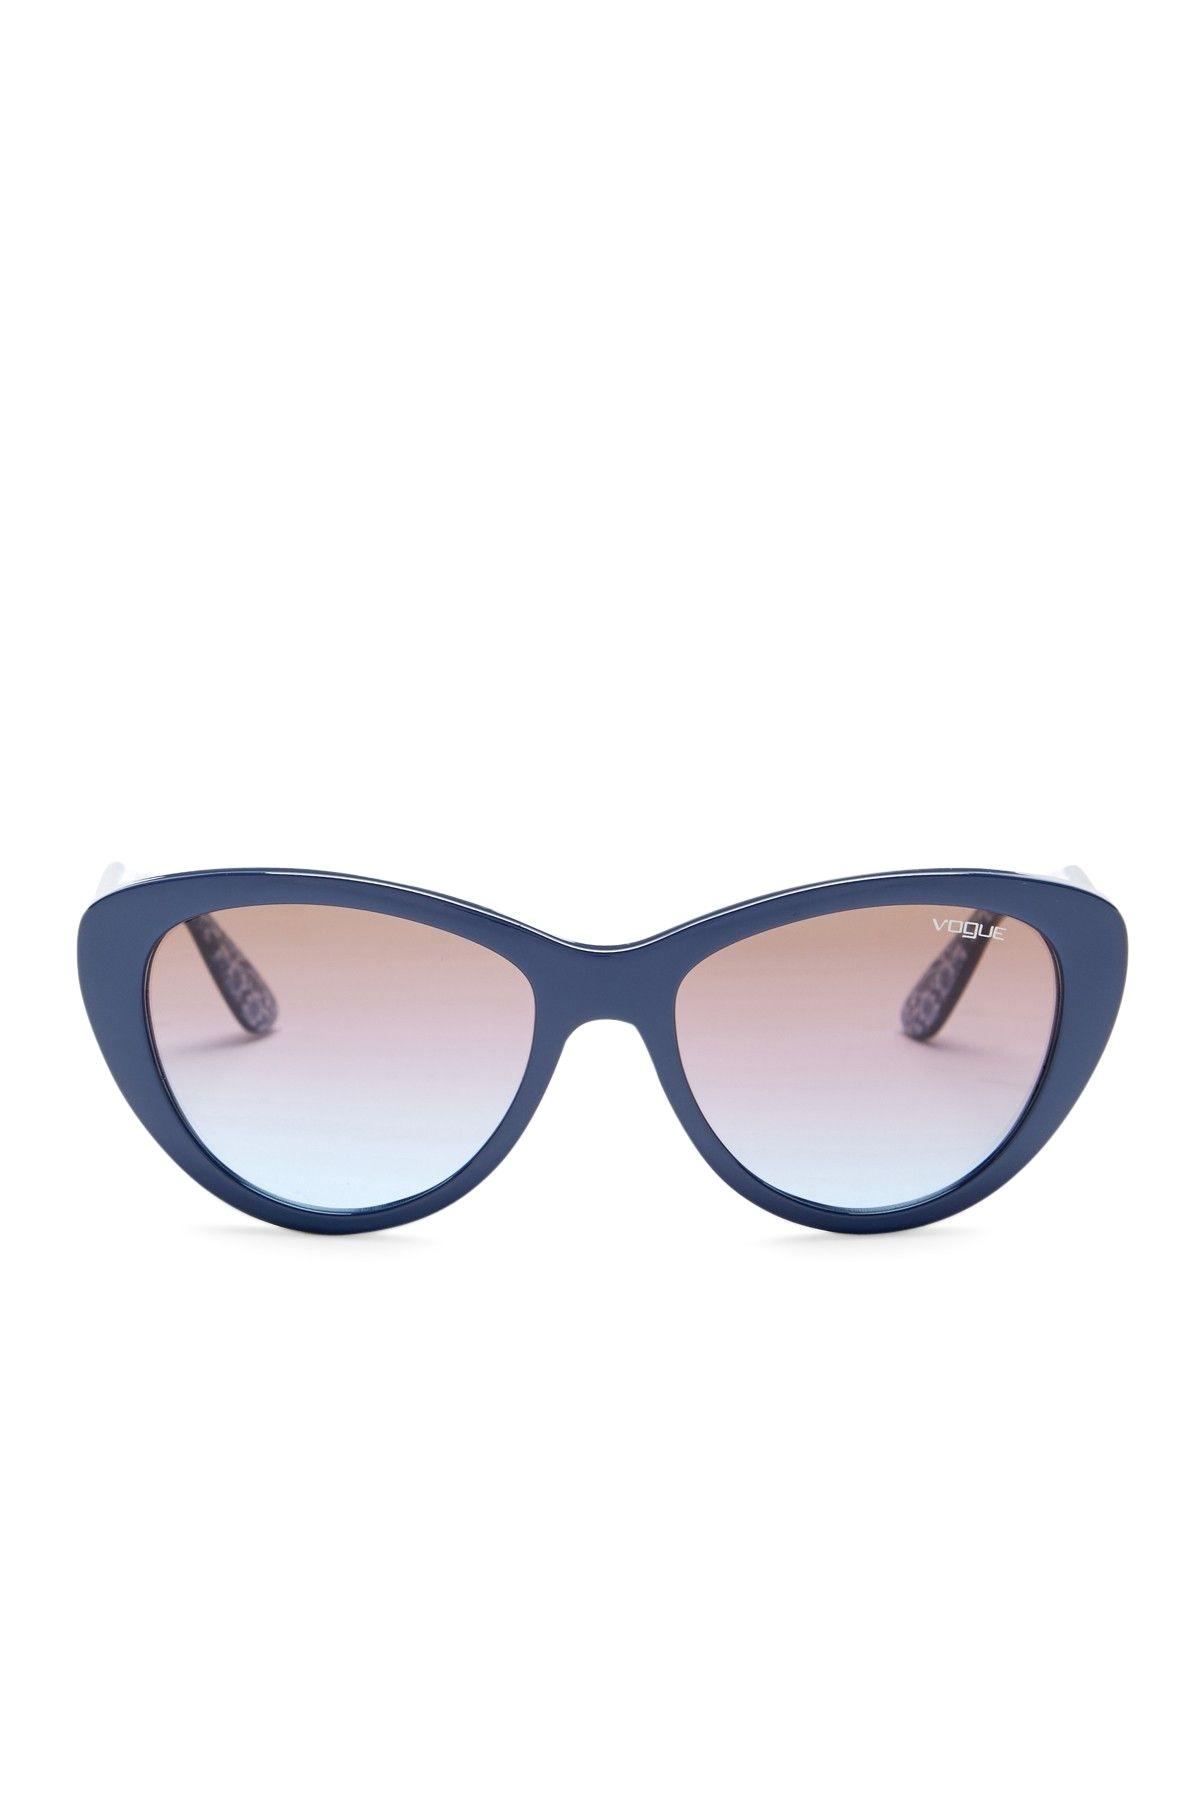 women s cat eye propionate frame sunglasses